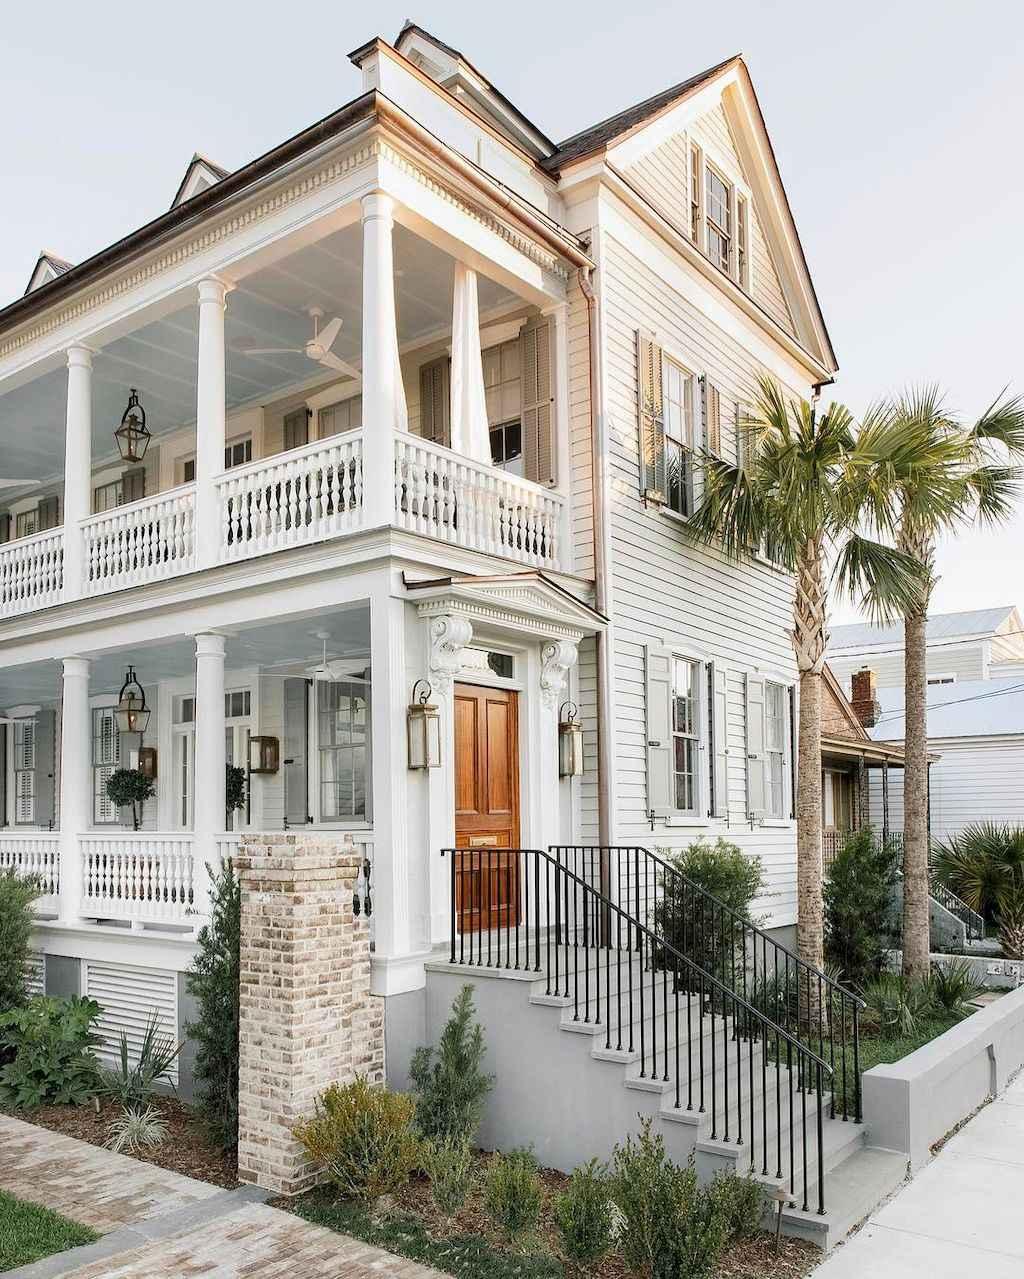 80 Awesome Plantation Homes Farmhouse Design Ideas (5